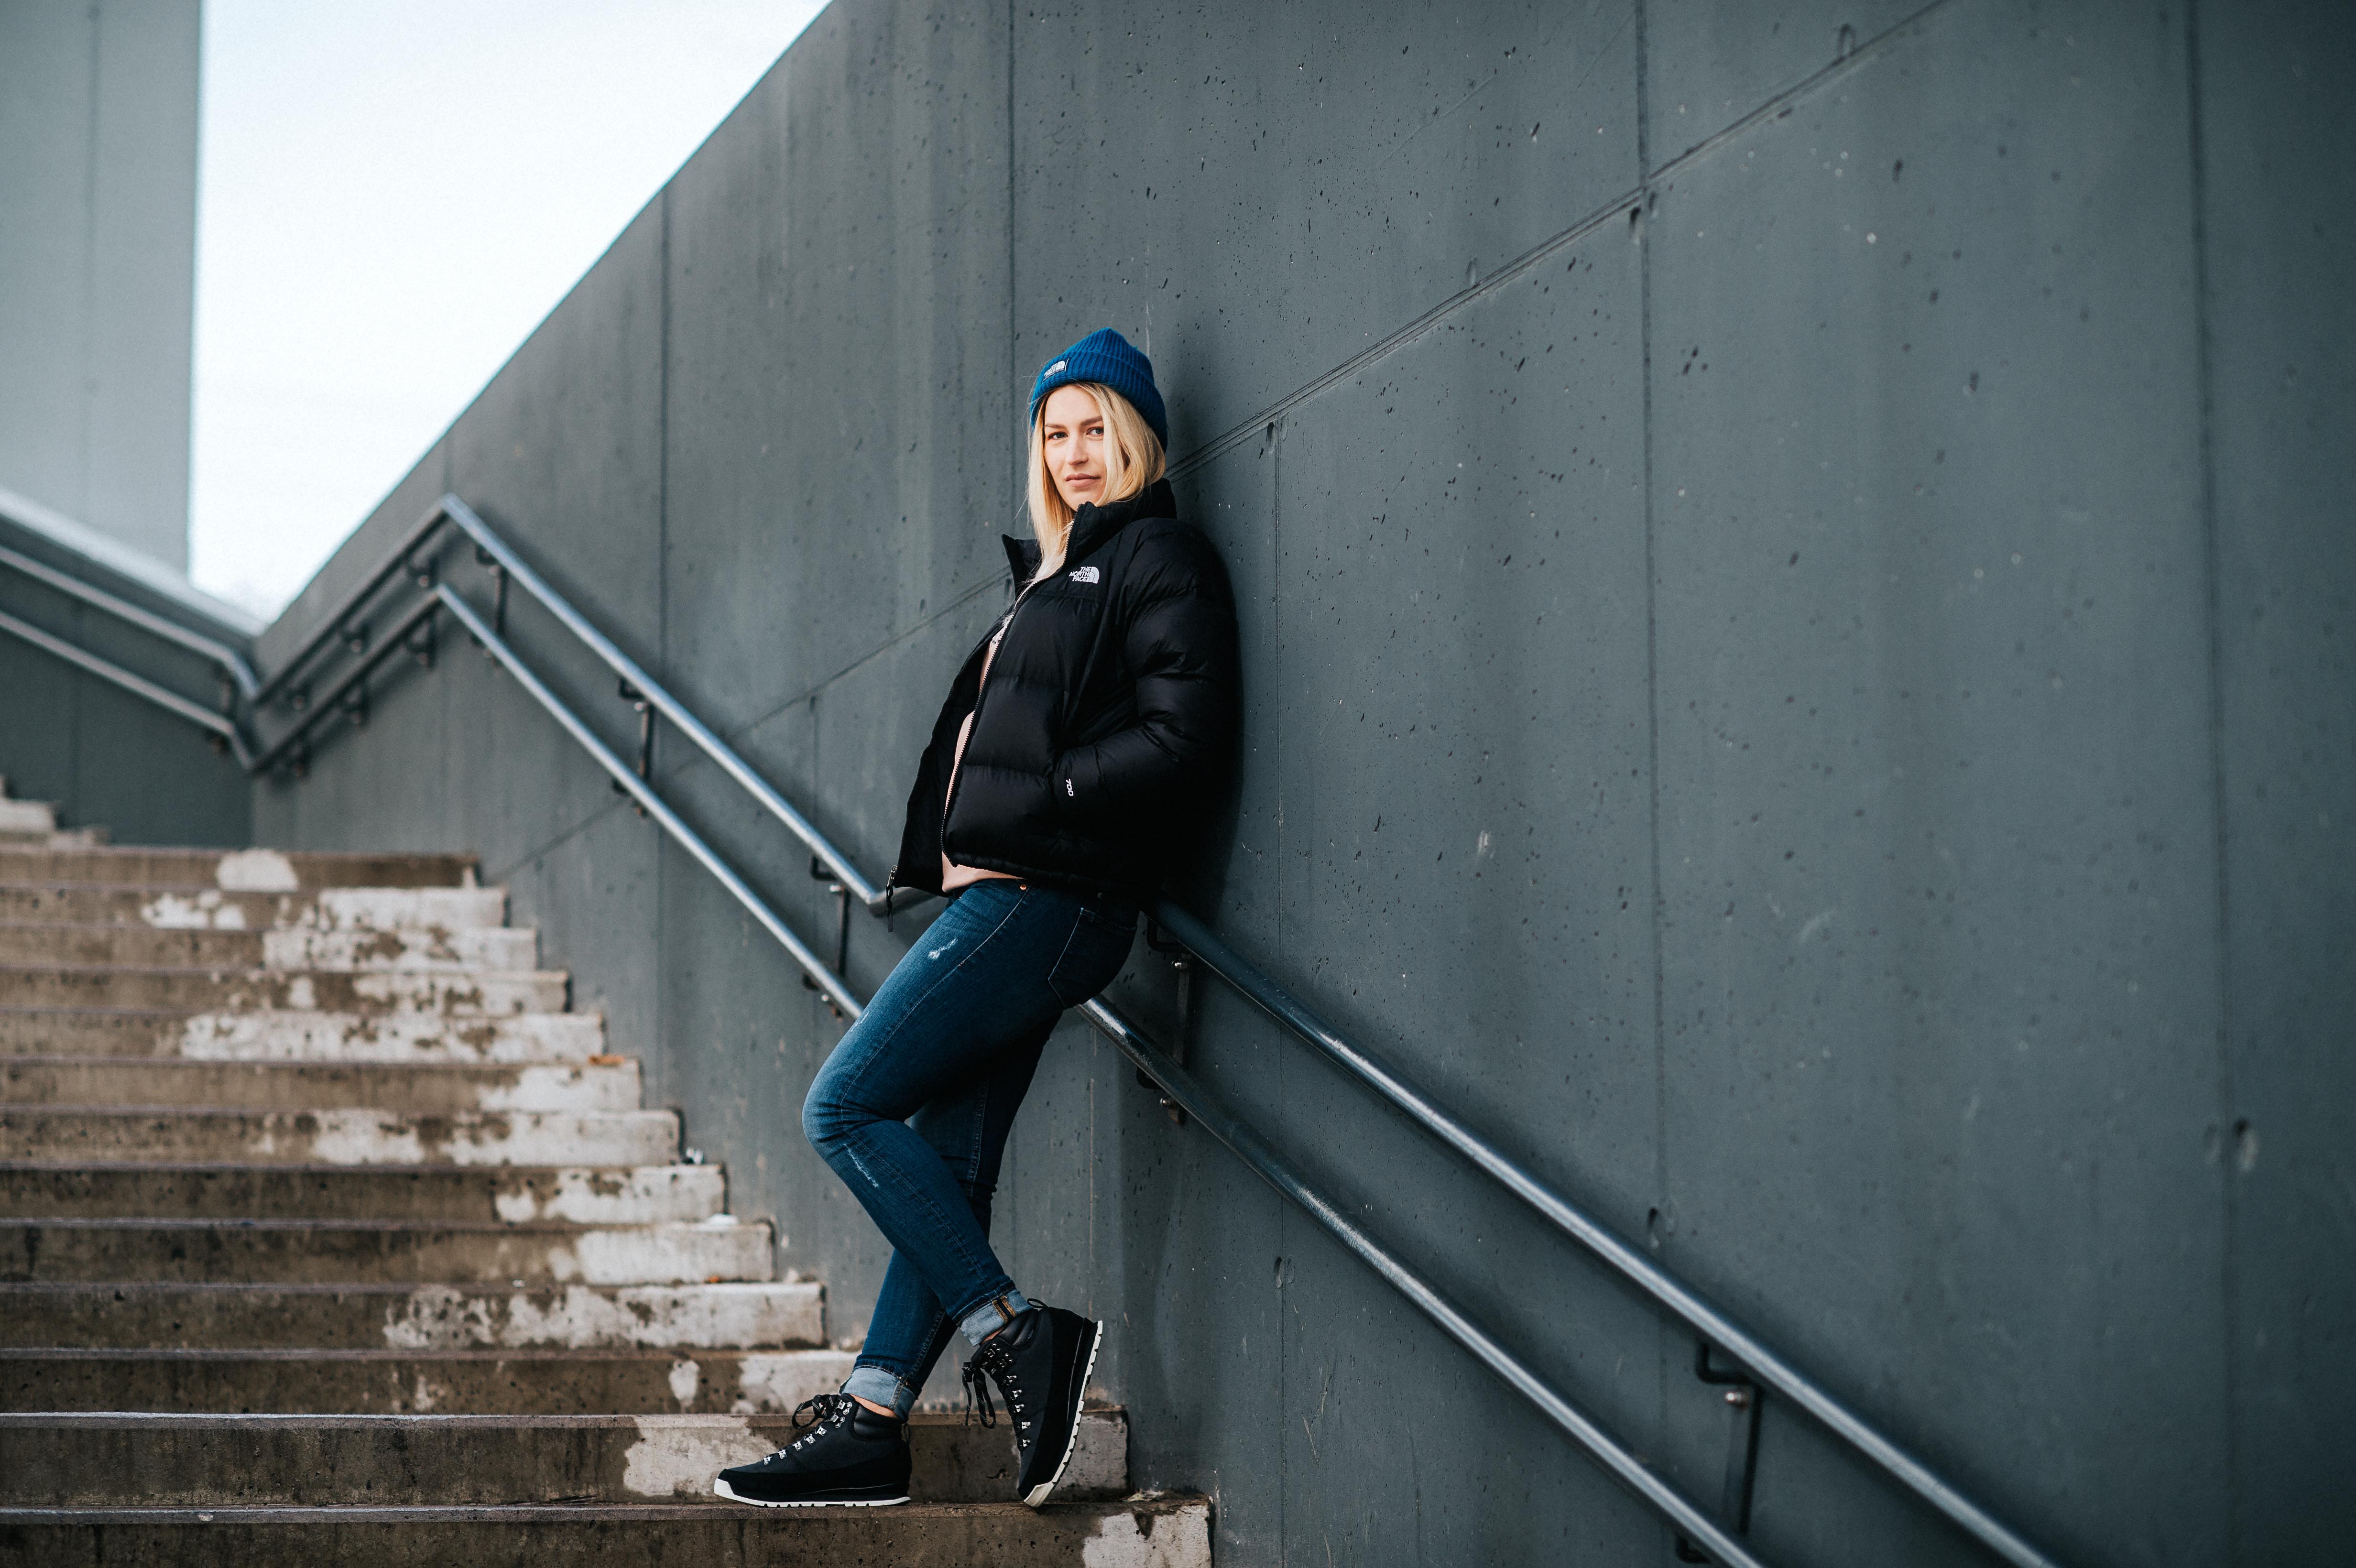 Karina Rästa